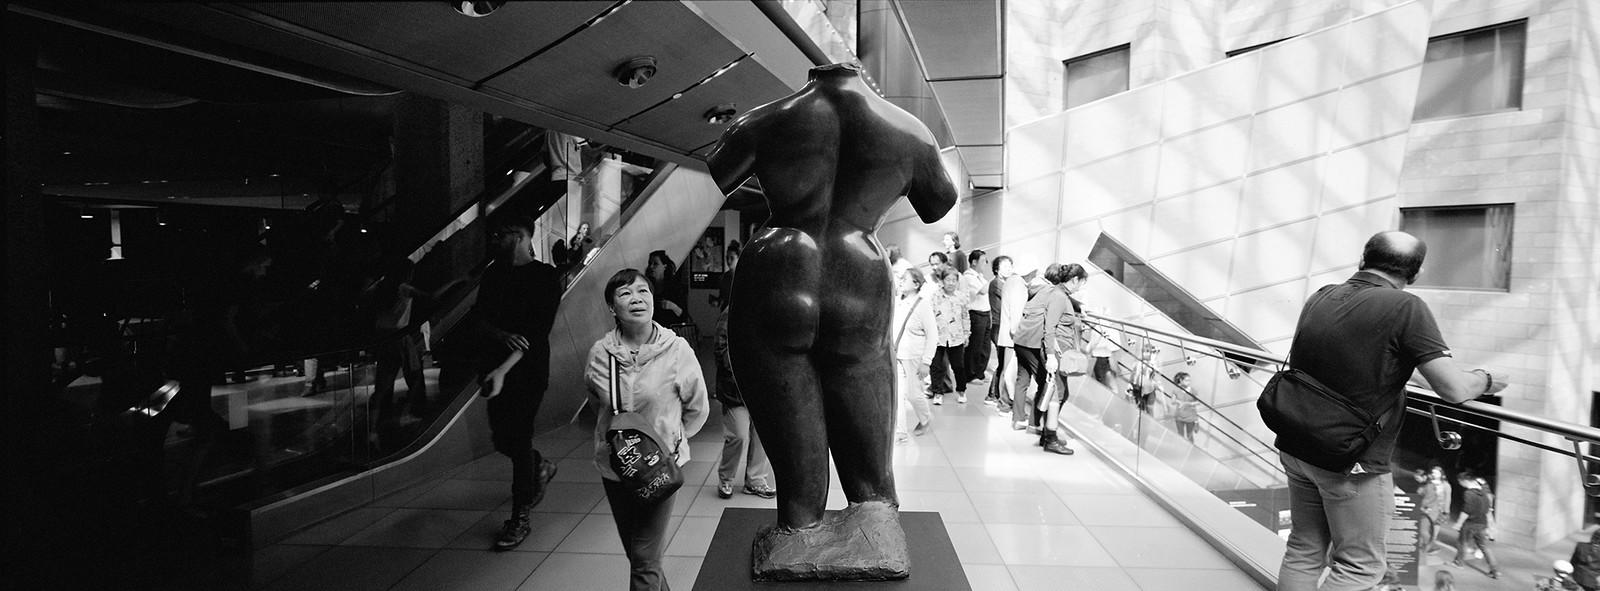 Statue Gazing